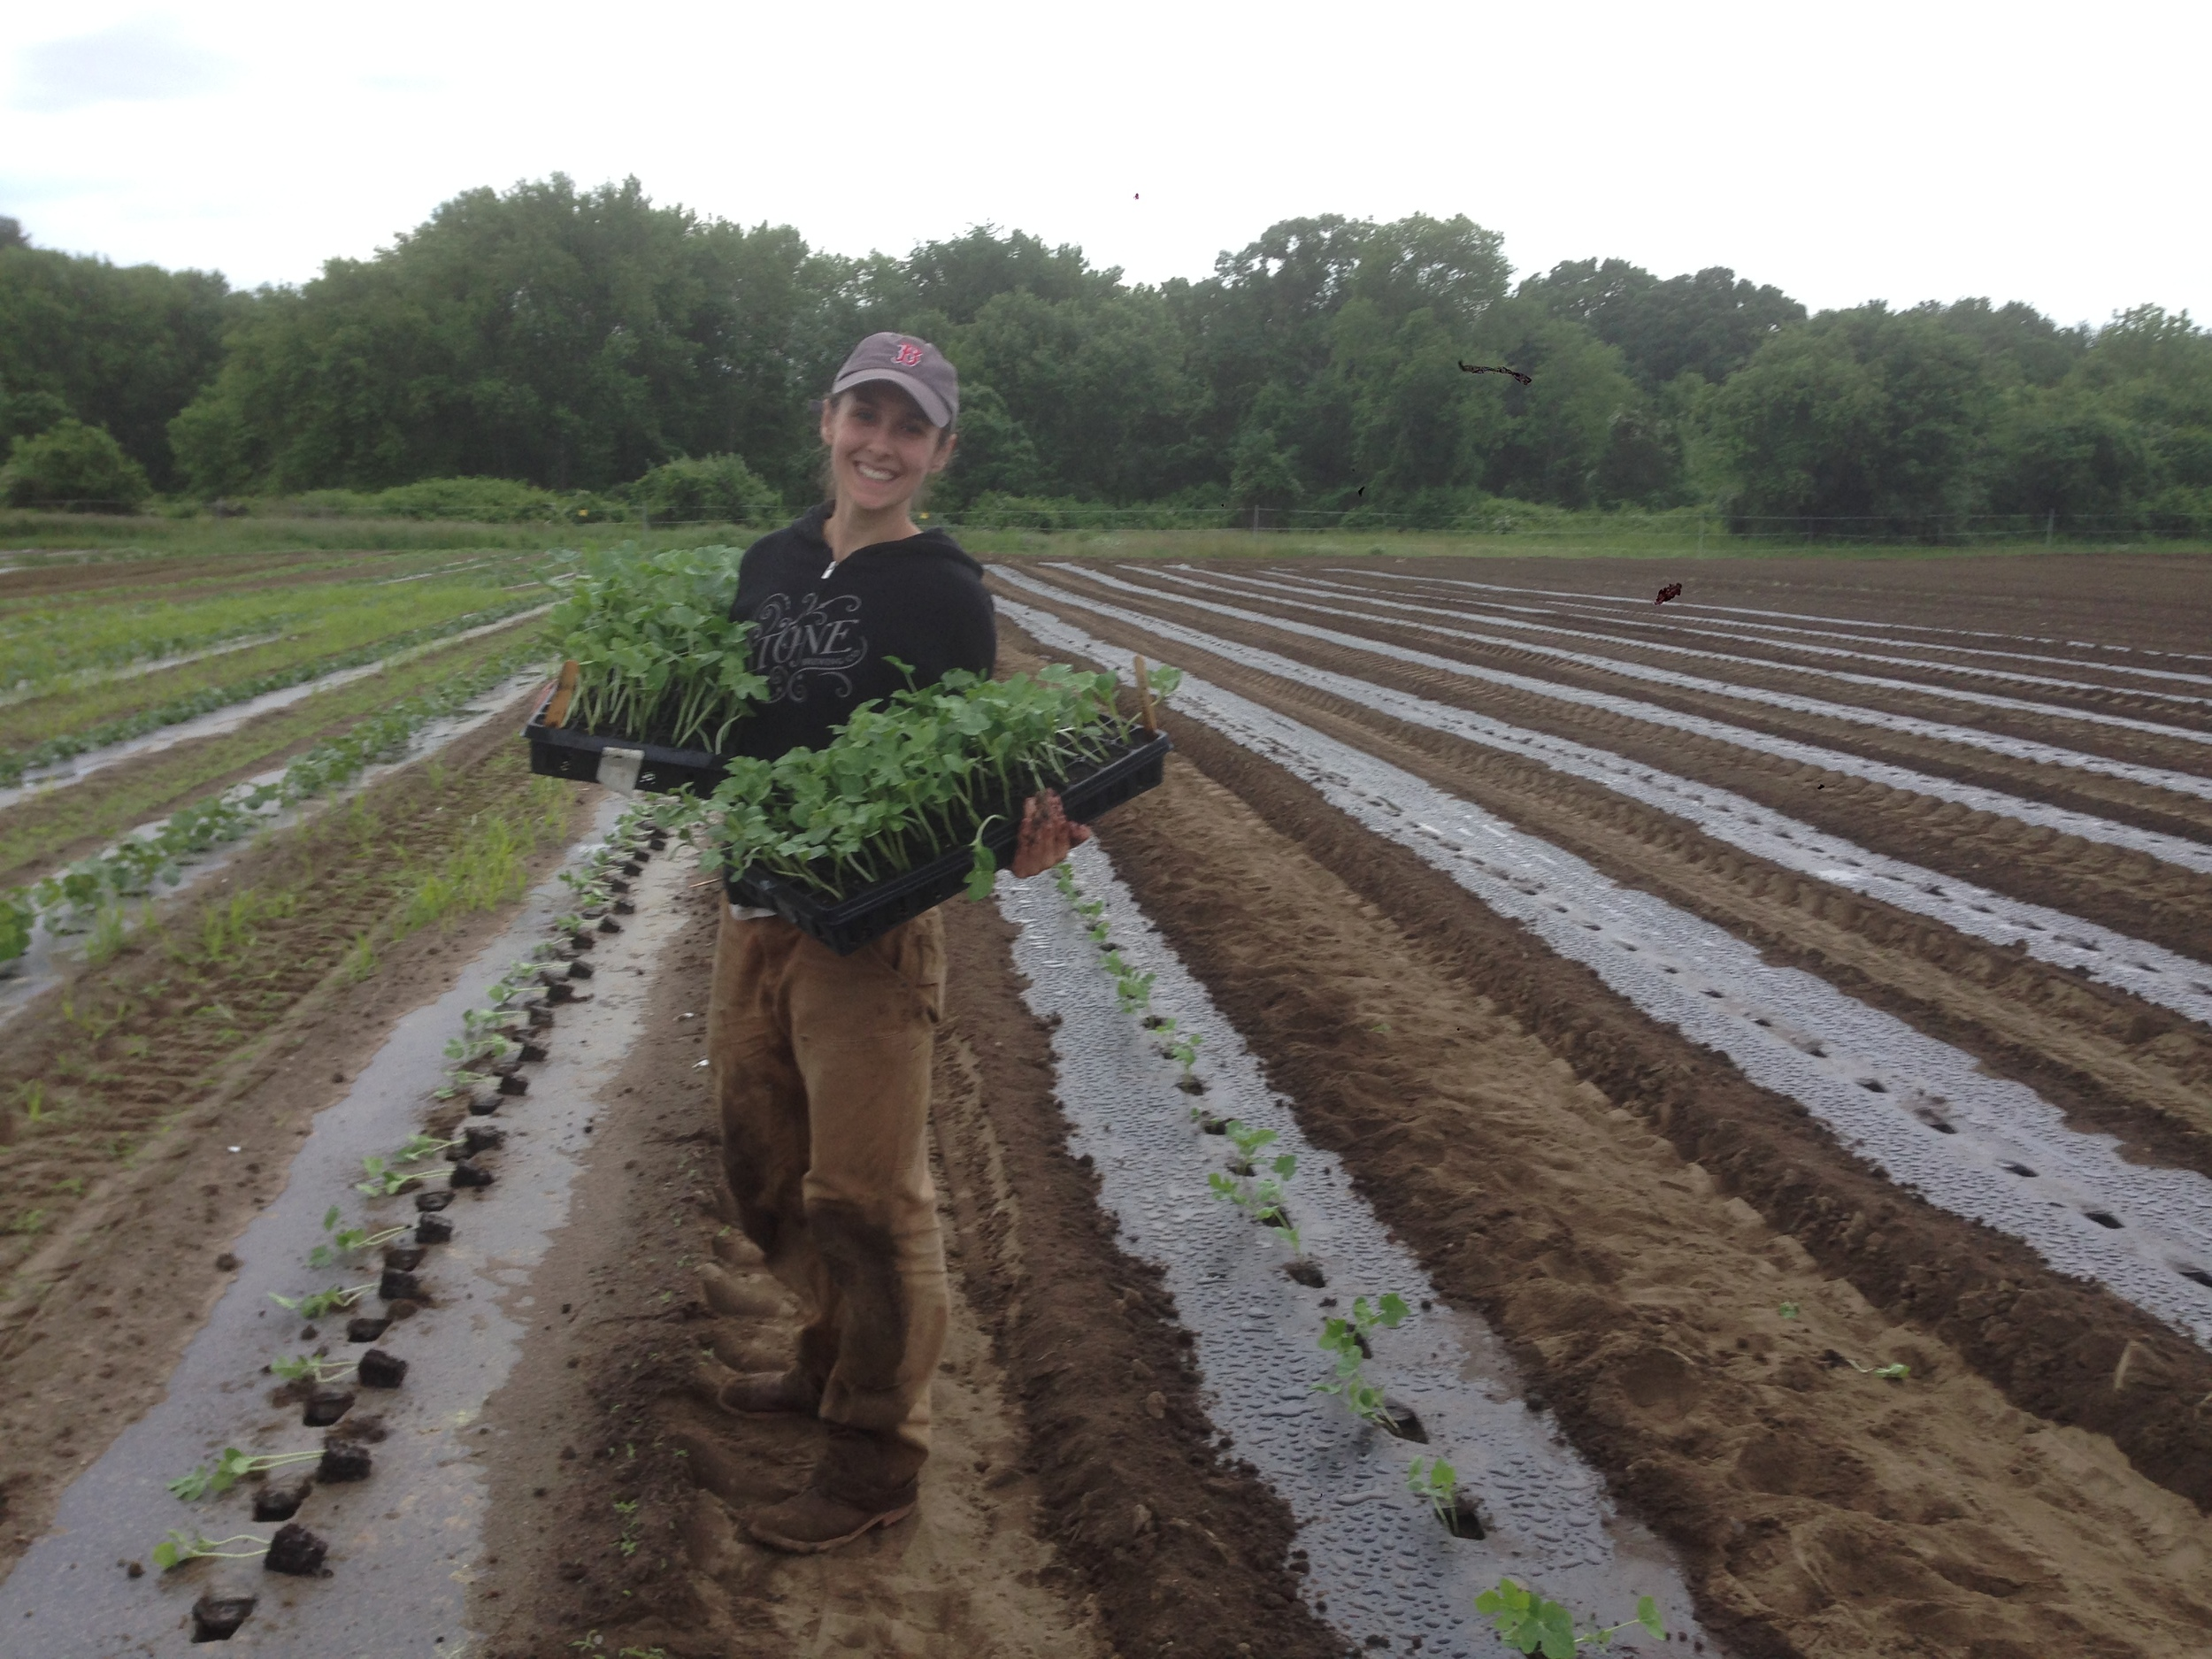 Lauren planting watermelon on Saturday